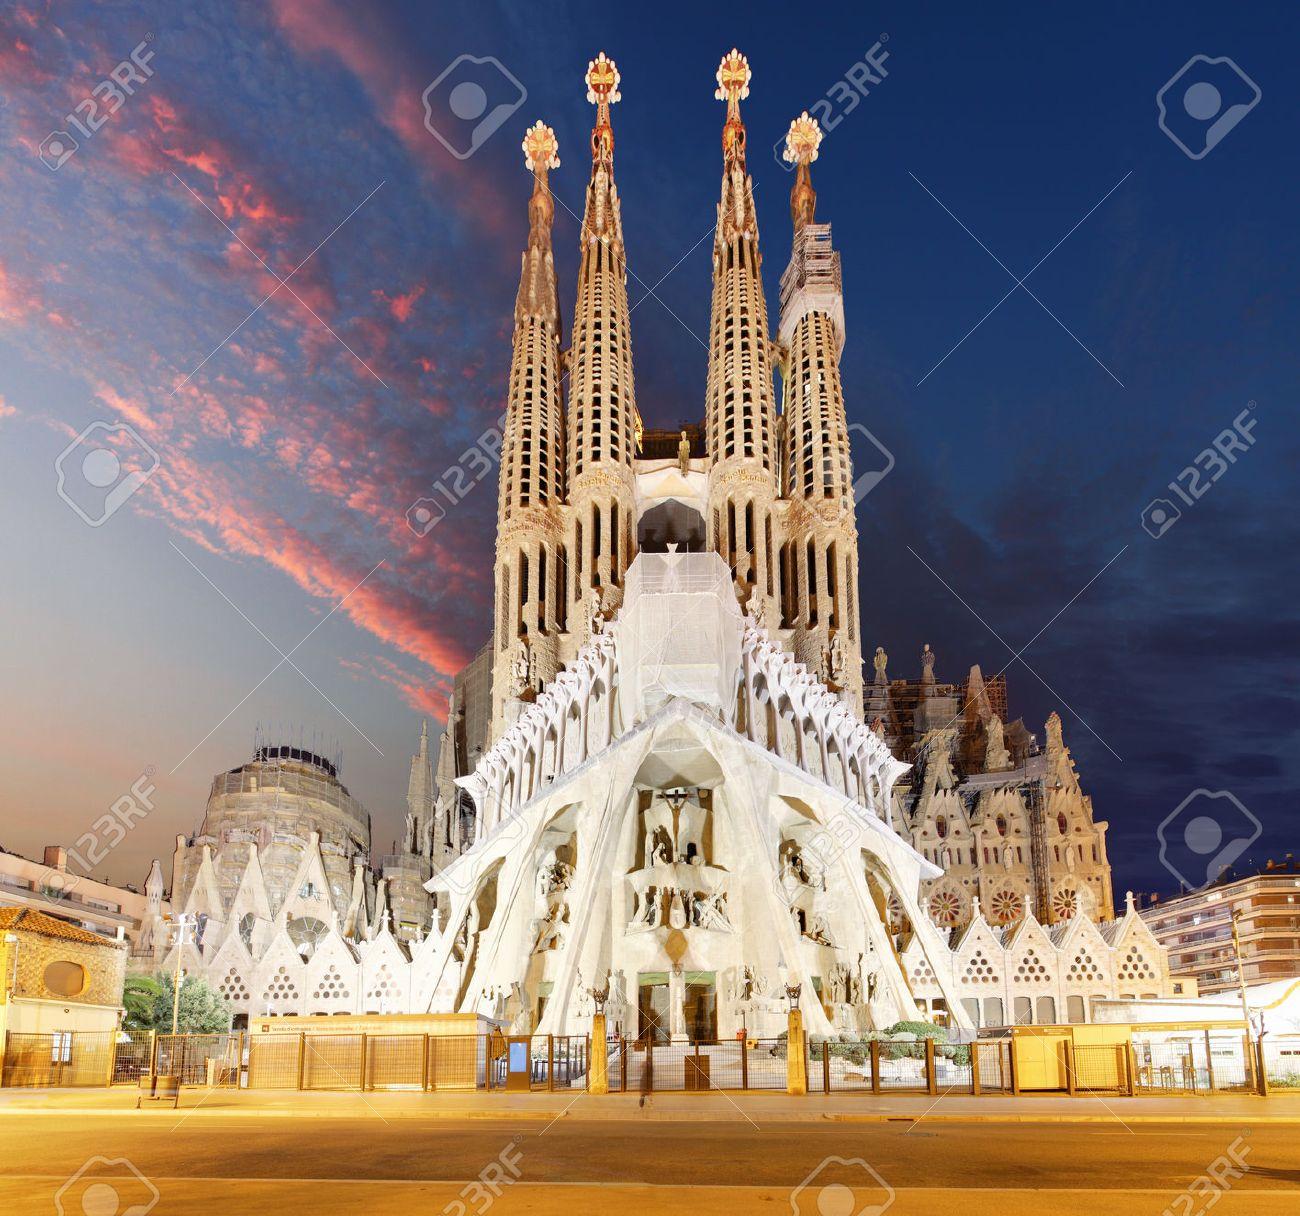 BARCELONA, SPAIN - FEBRUARY 10, 2016: Sagrada Familia basilica in Barcelona. The Antoni Gaudi masterpiece has become a UNESCO World Heritage Site in 1984. - 53269494